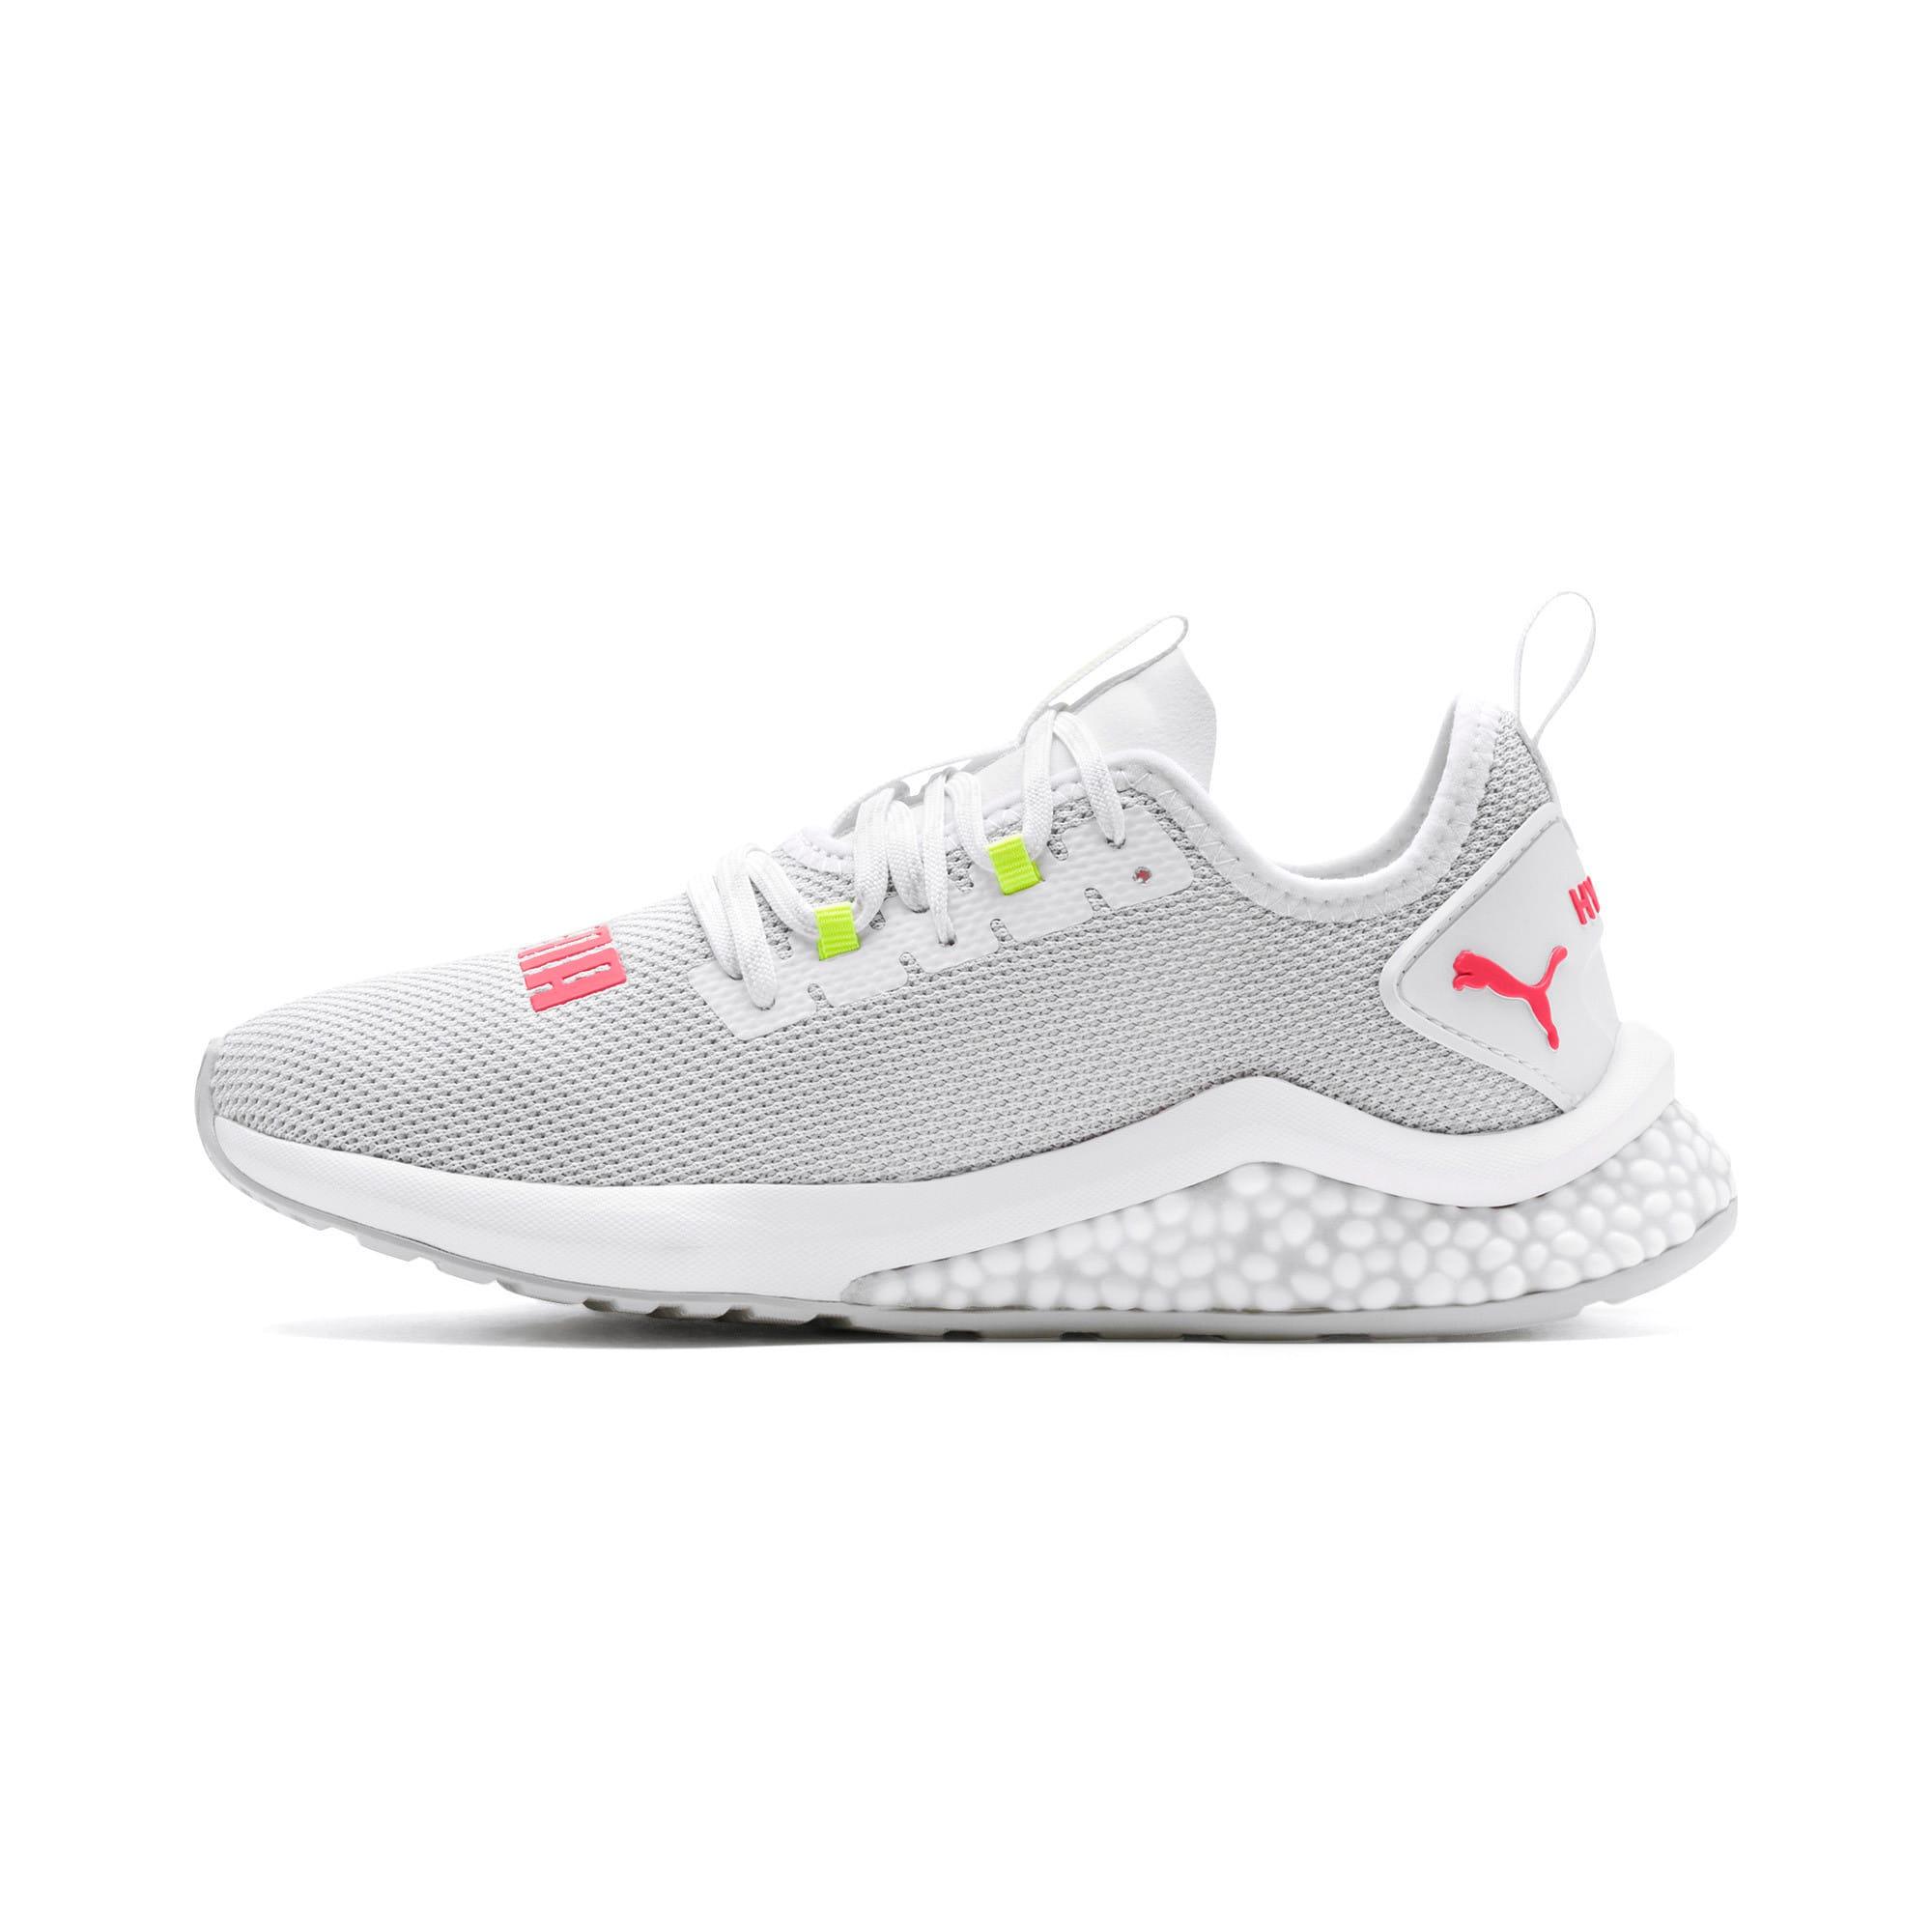 Thumbnail 1 of HYBRID NX Women's Running Shoes, Puma White-Pink Alert, medium